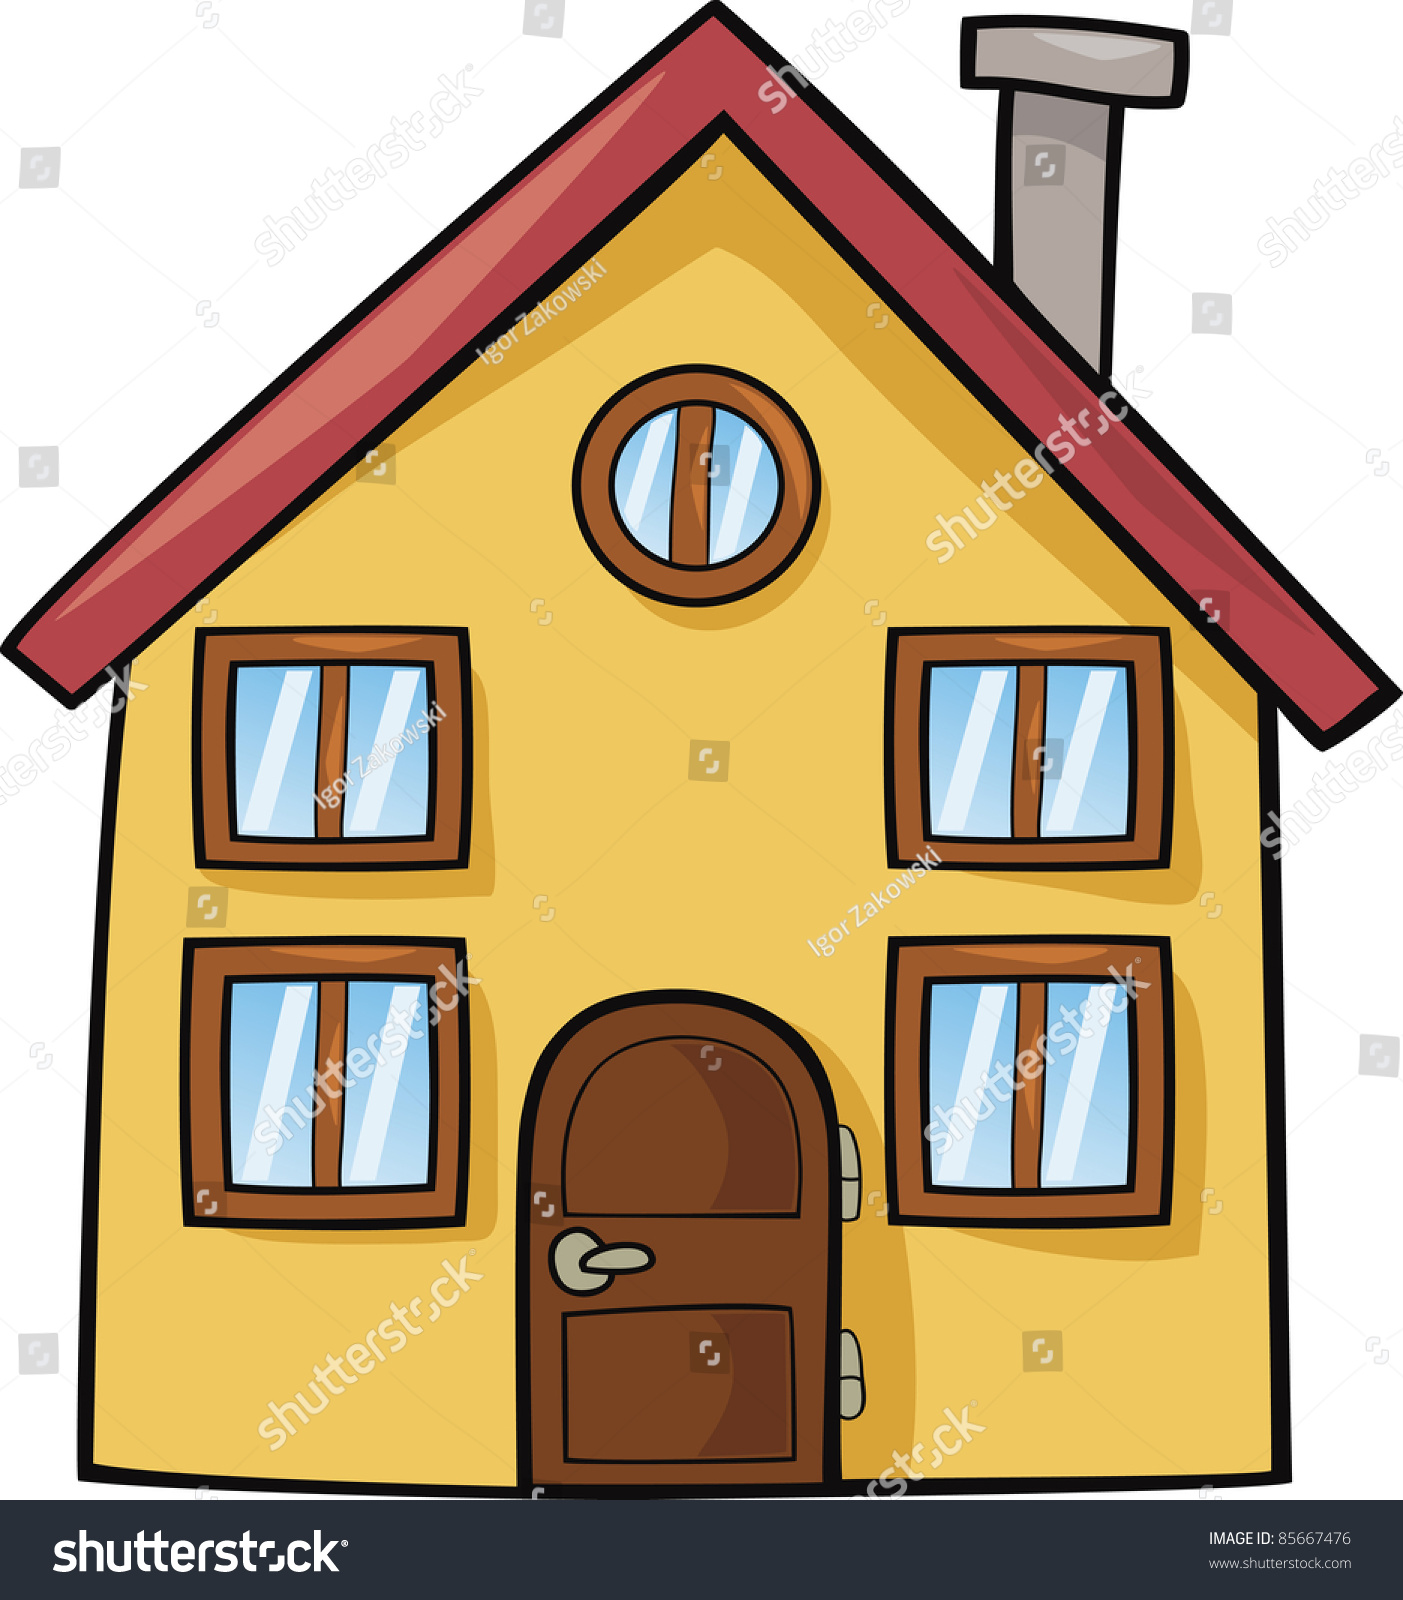 cartoon clipart of houses - photo #40